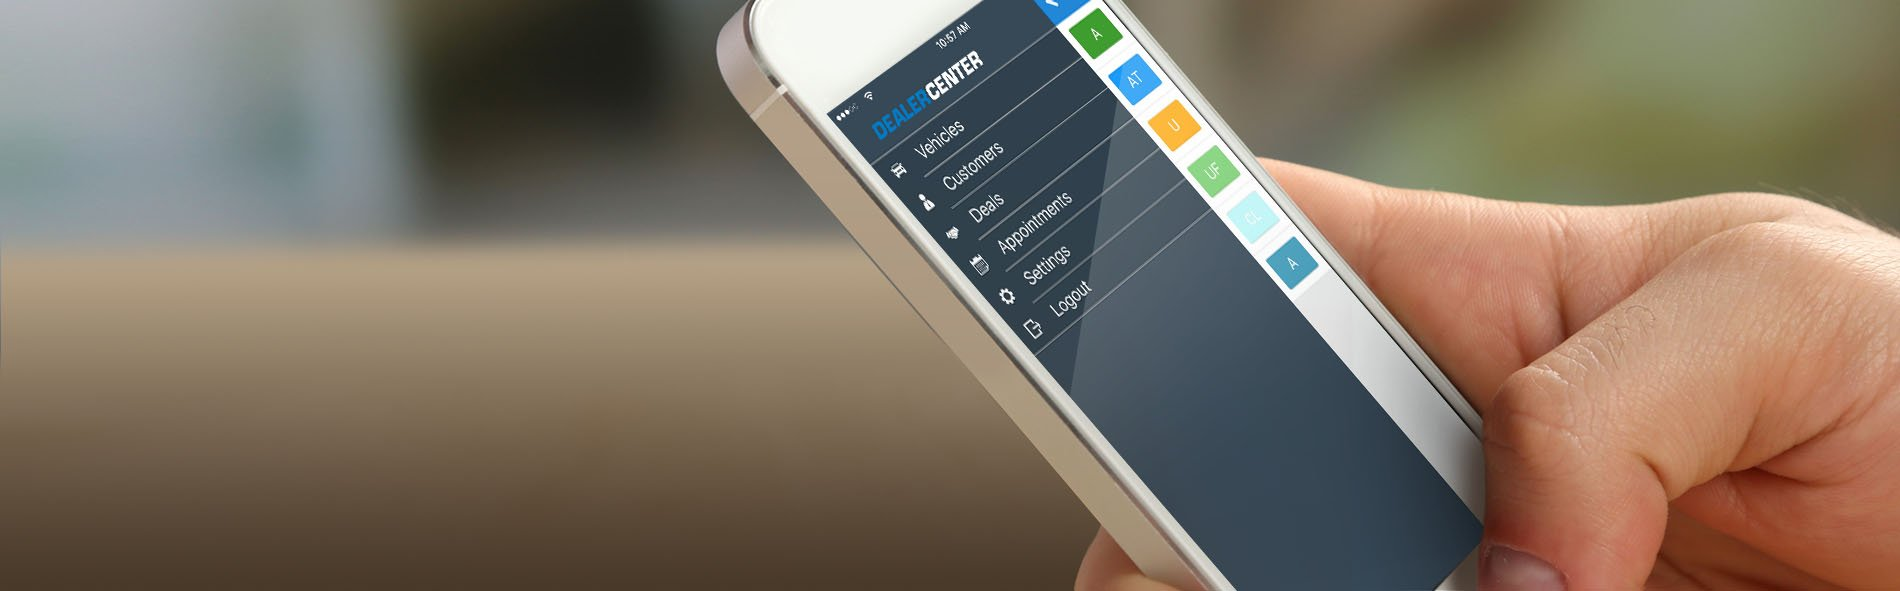 DealerCenter mobile app